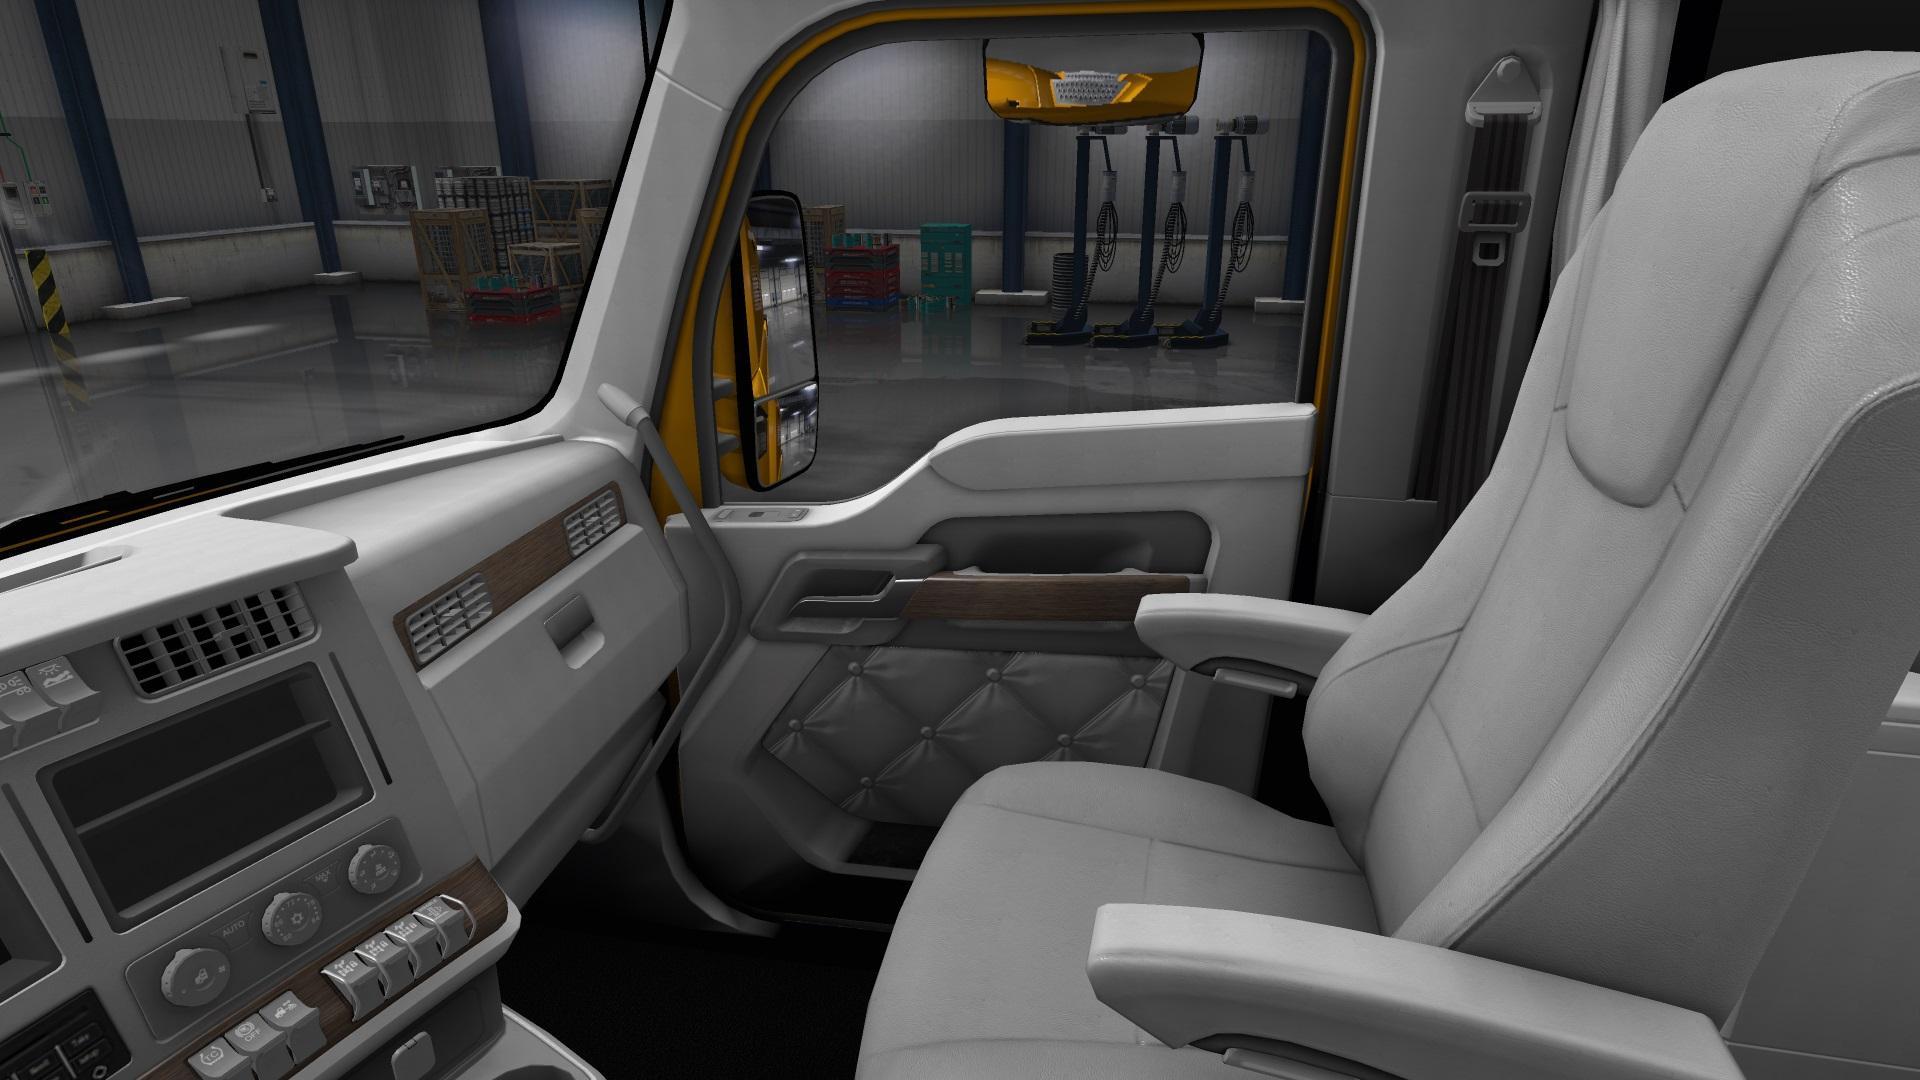 kenworth t680 white gauges truck interior v1 2 for ats ats mod american truck simulator mod. Black Bedroom Furniture Sets. Home Design Ideas